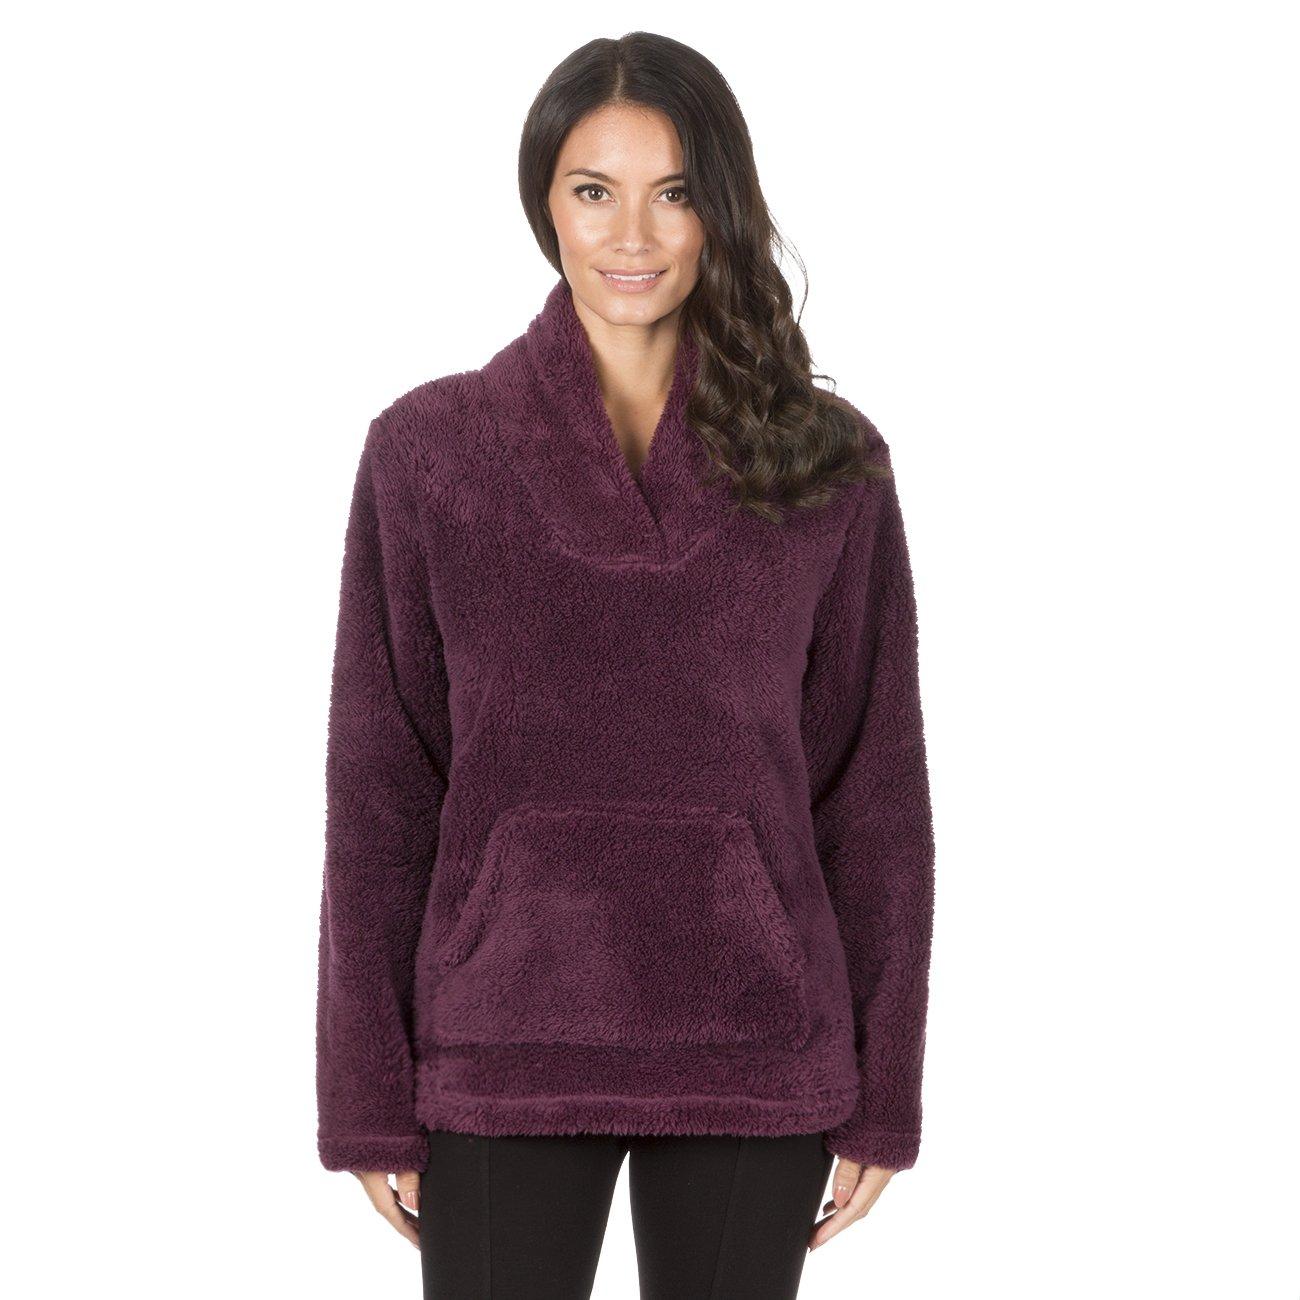 Forever Dreaming Ladies Shawl Collar Bed Jacket - Snuggle Fleece Pyjama Top Lounge Jumper